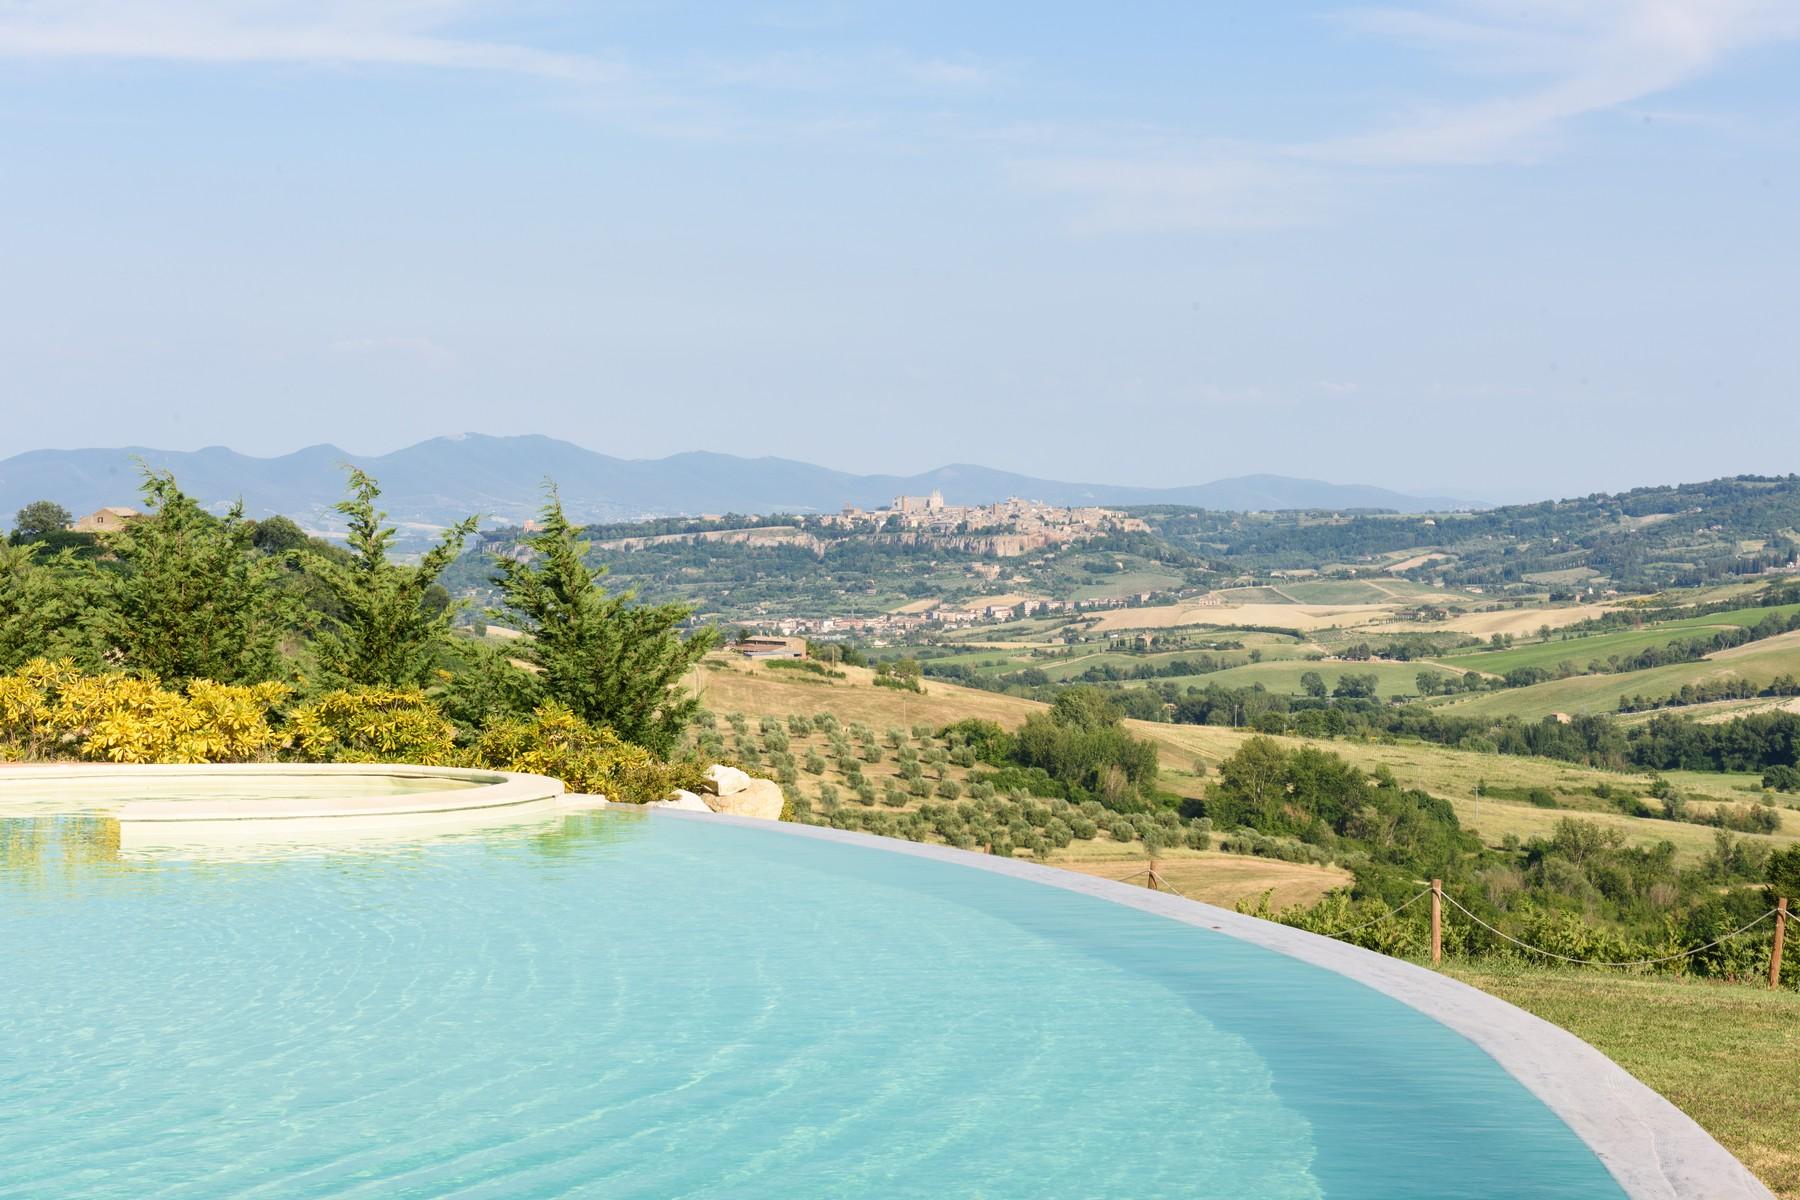 Casa indipendente in Vendita a Castel Viscardo: 5 locali, 700 mq - Foto 1